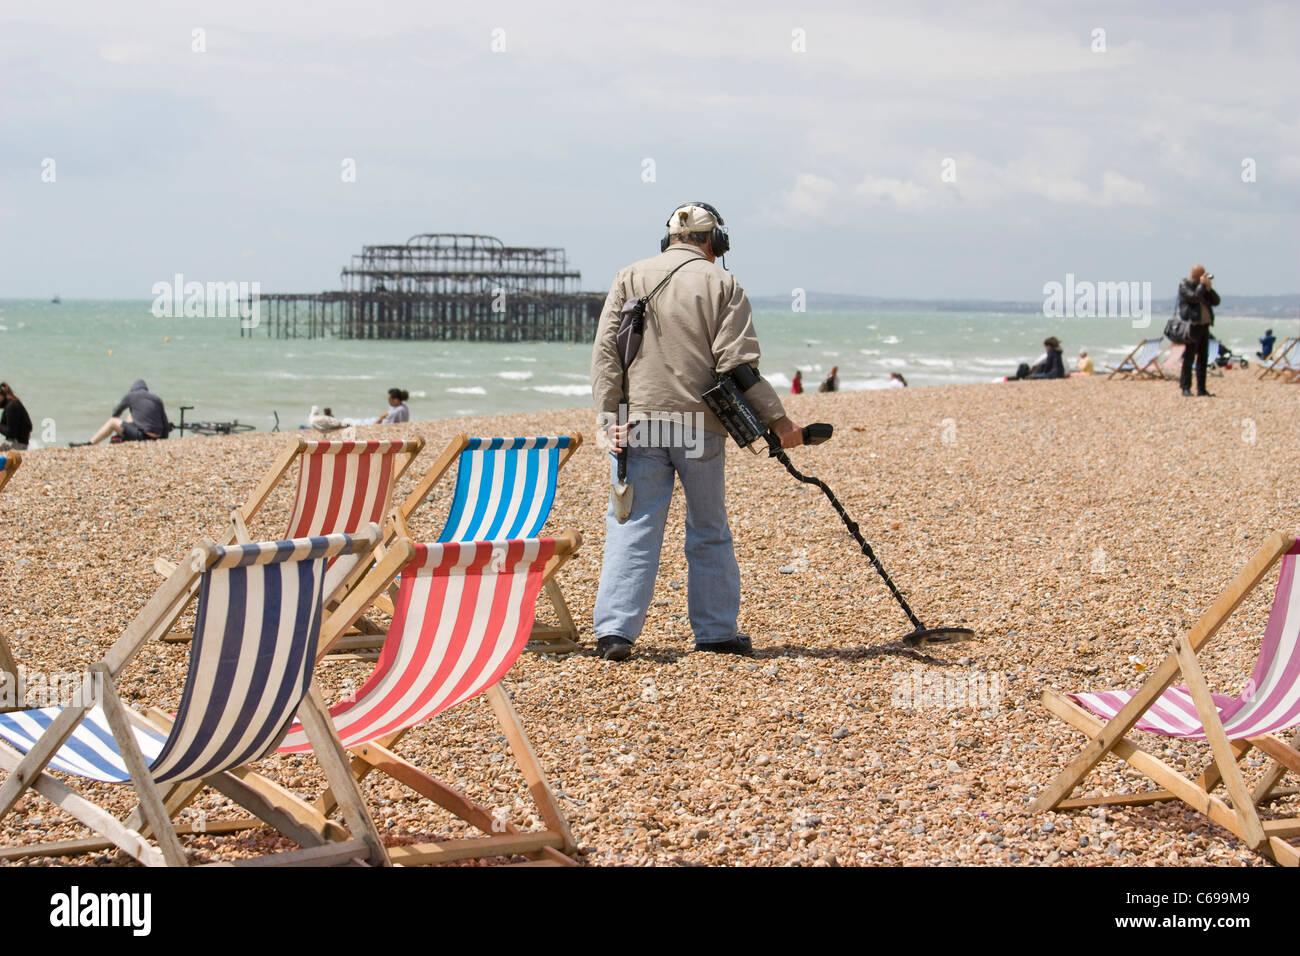 Brighton Sussex metal detector, man searching for coins with a metal detector on brighton beach - Stock Image